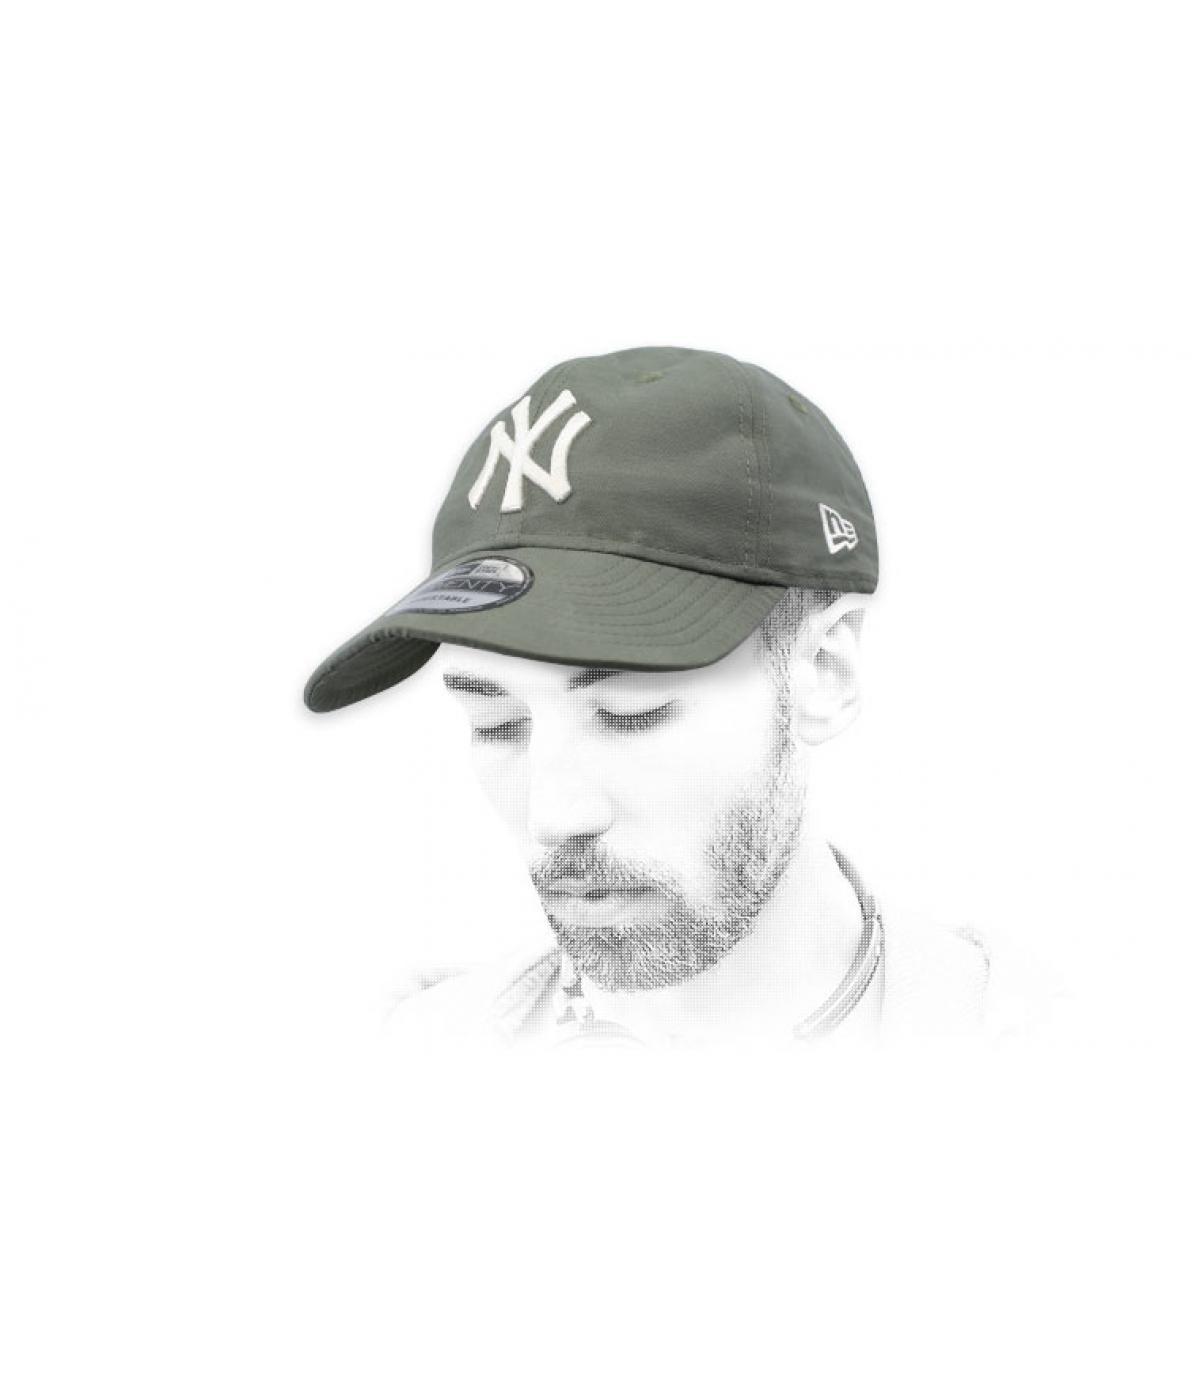 gorra plegable NY verde